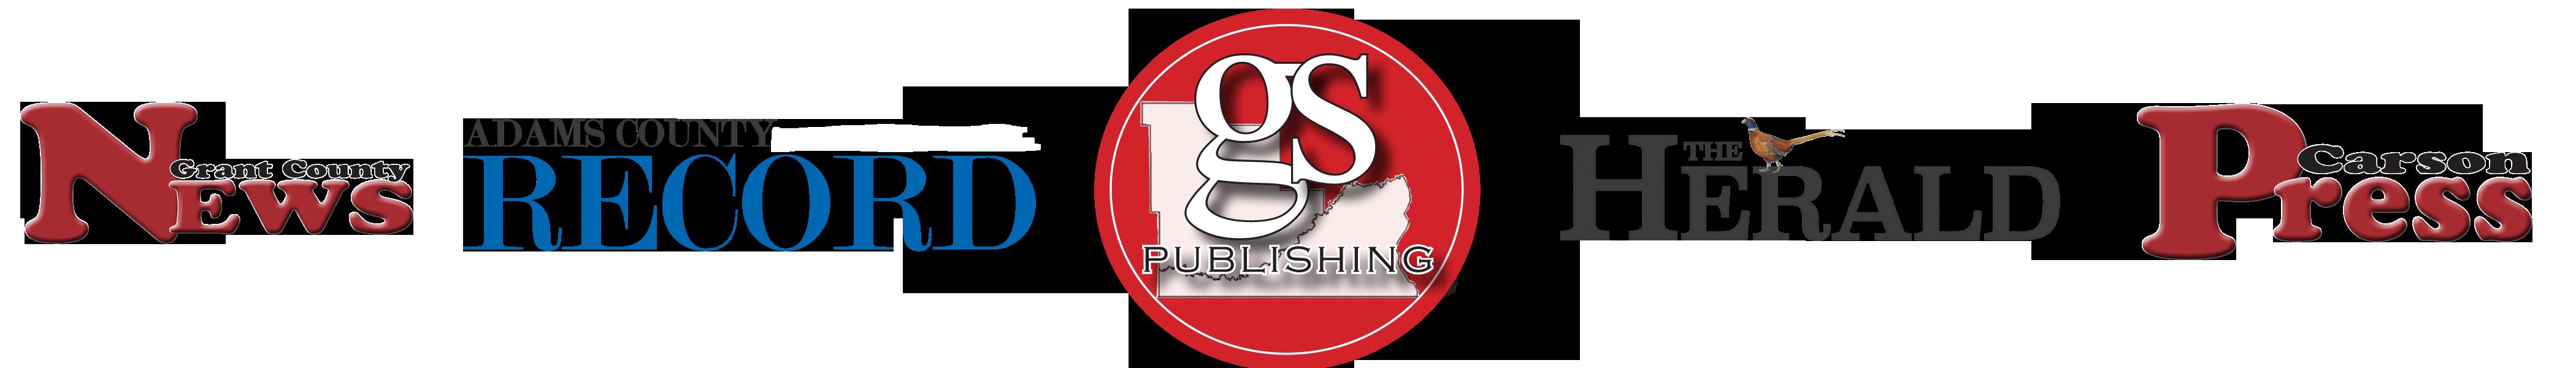 Grant County News Logo